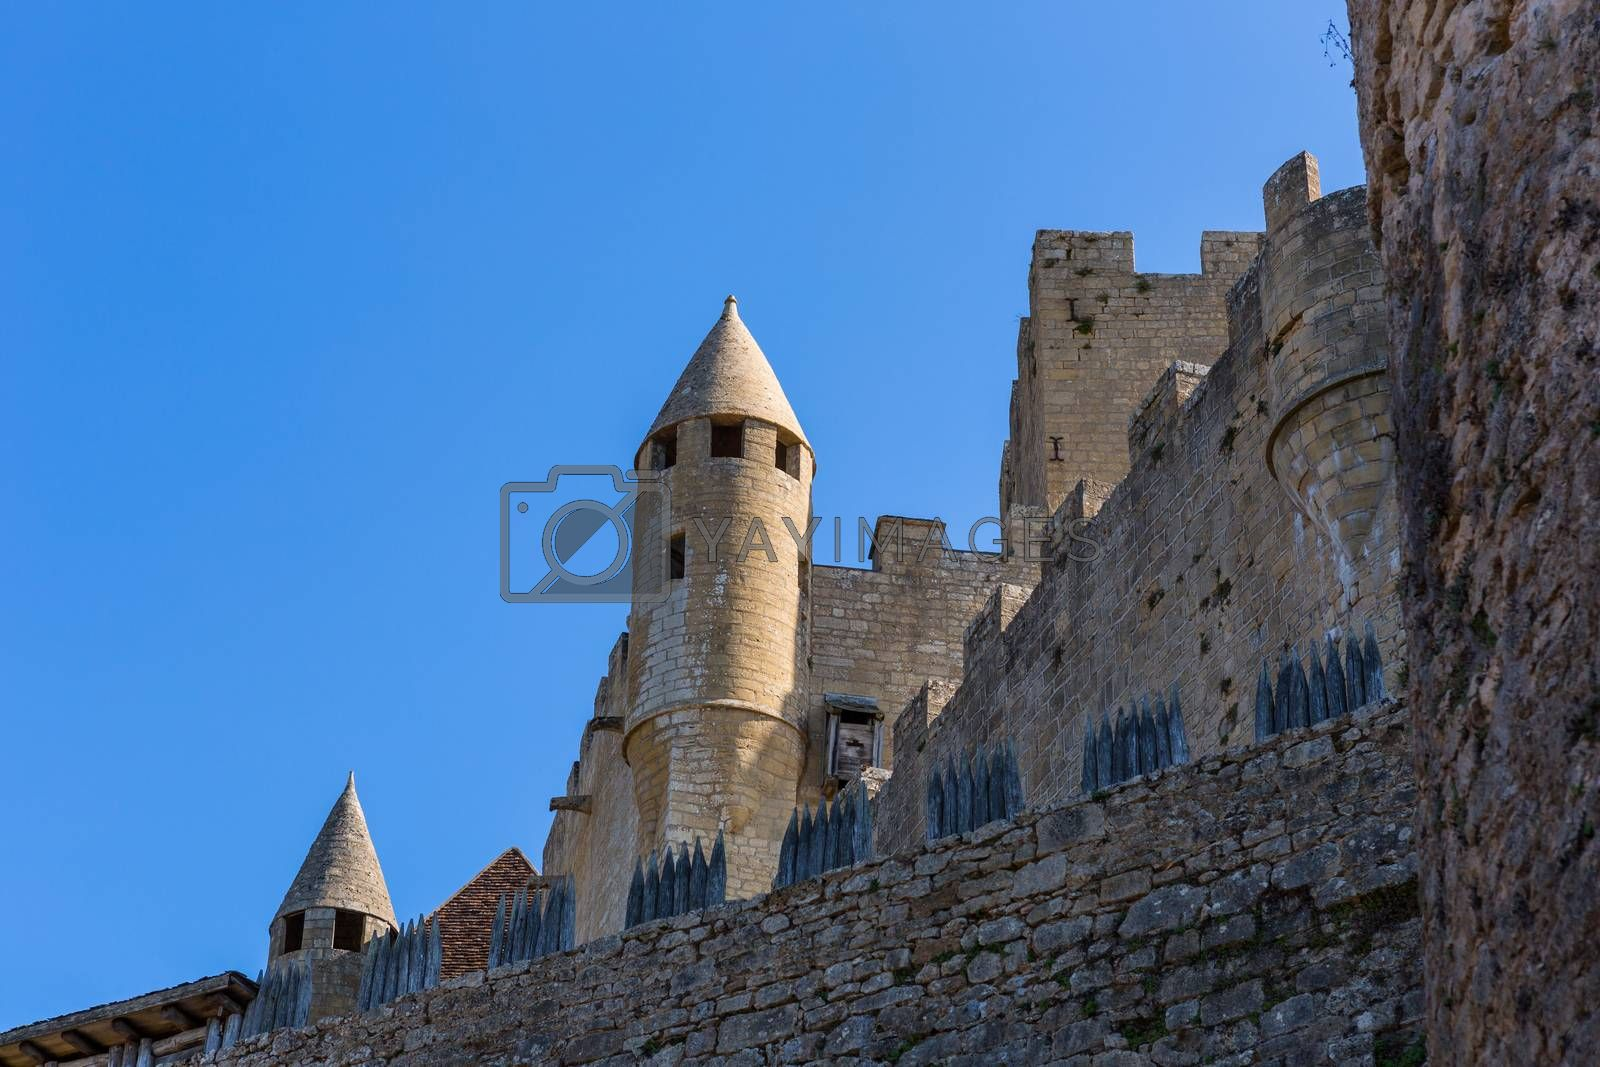 The medieval Chateau de Beynac rising on a limestone cliff above the Dordogne River. France, Dordogne department, Beynac-et-Cazenac